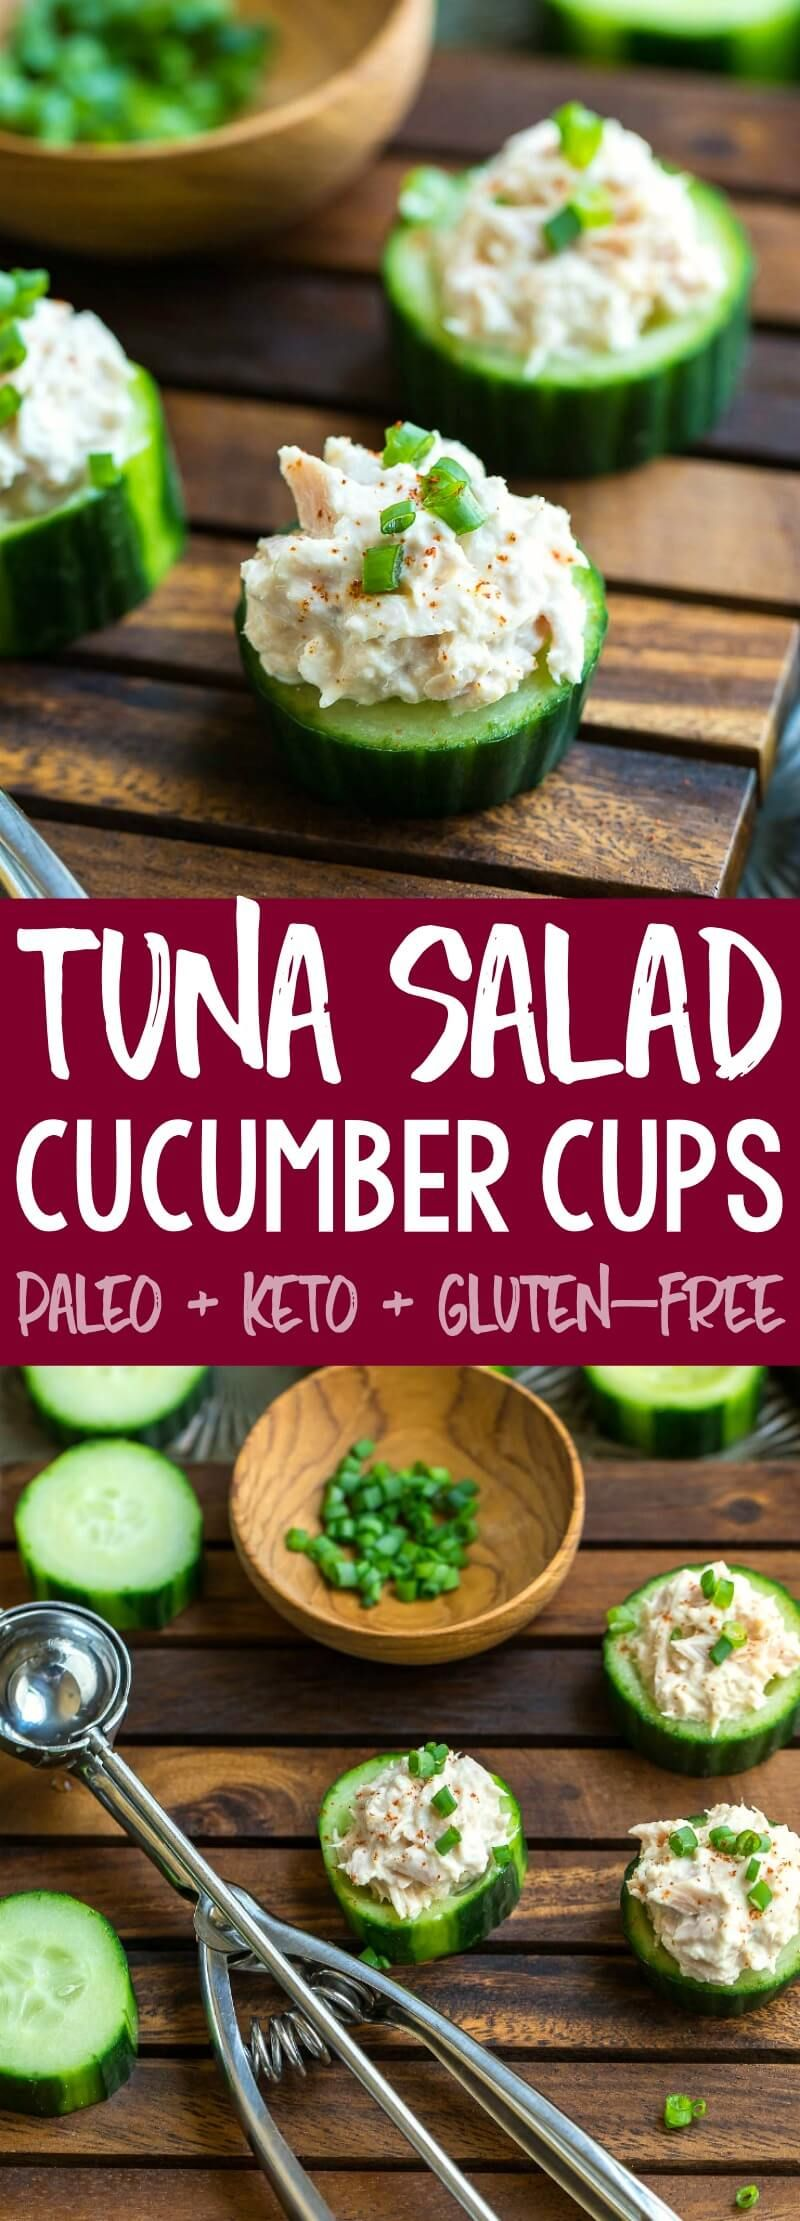 Tuna Salad Cucumber Cups Recipe - Peas and Crayons